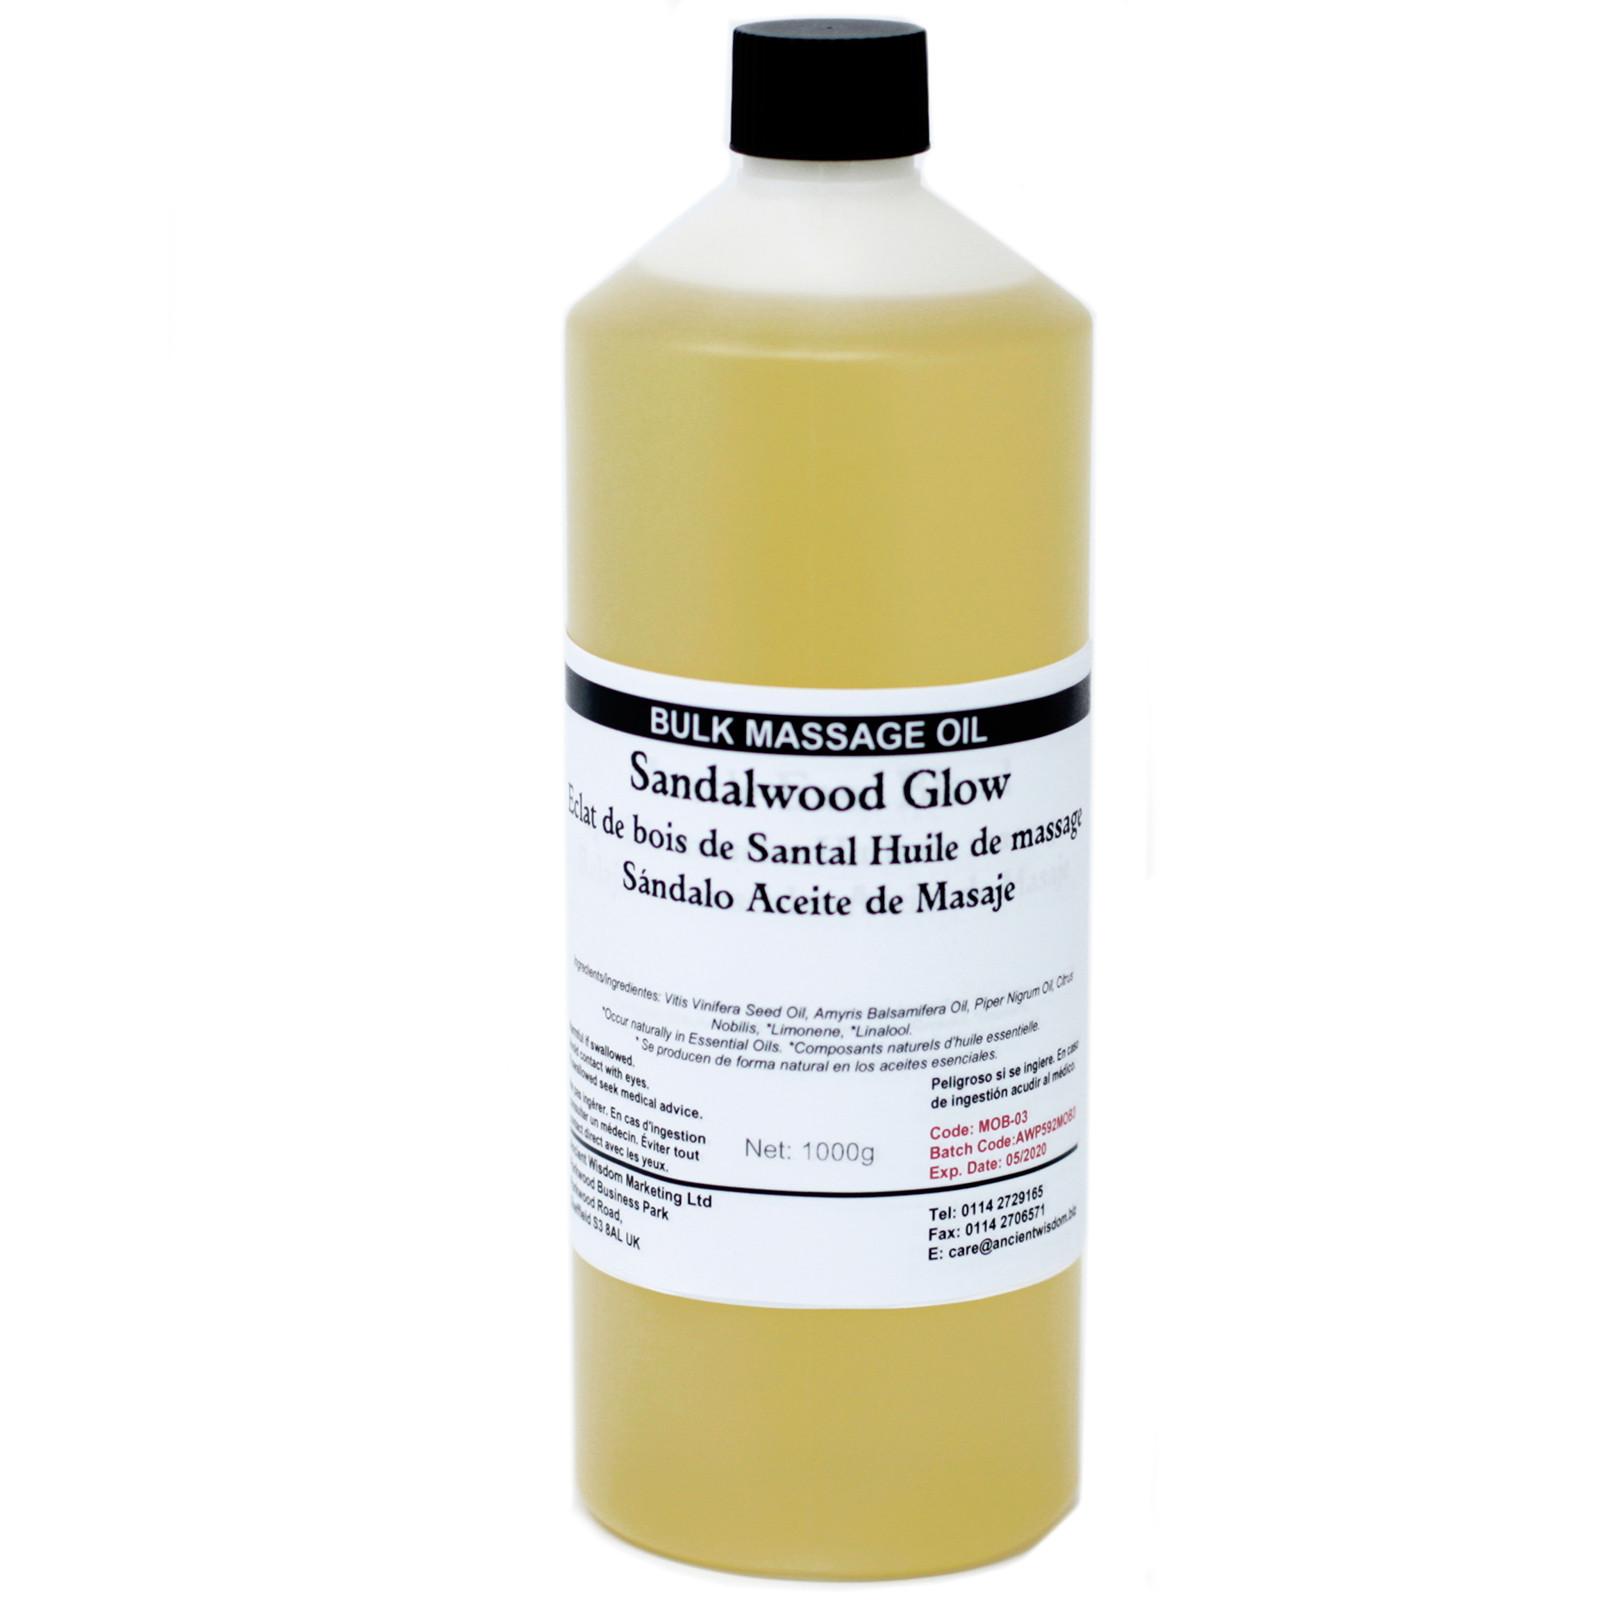 Sandalwood Glow 1Kg Massage Oil